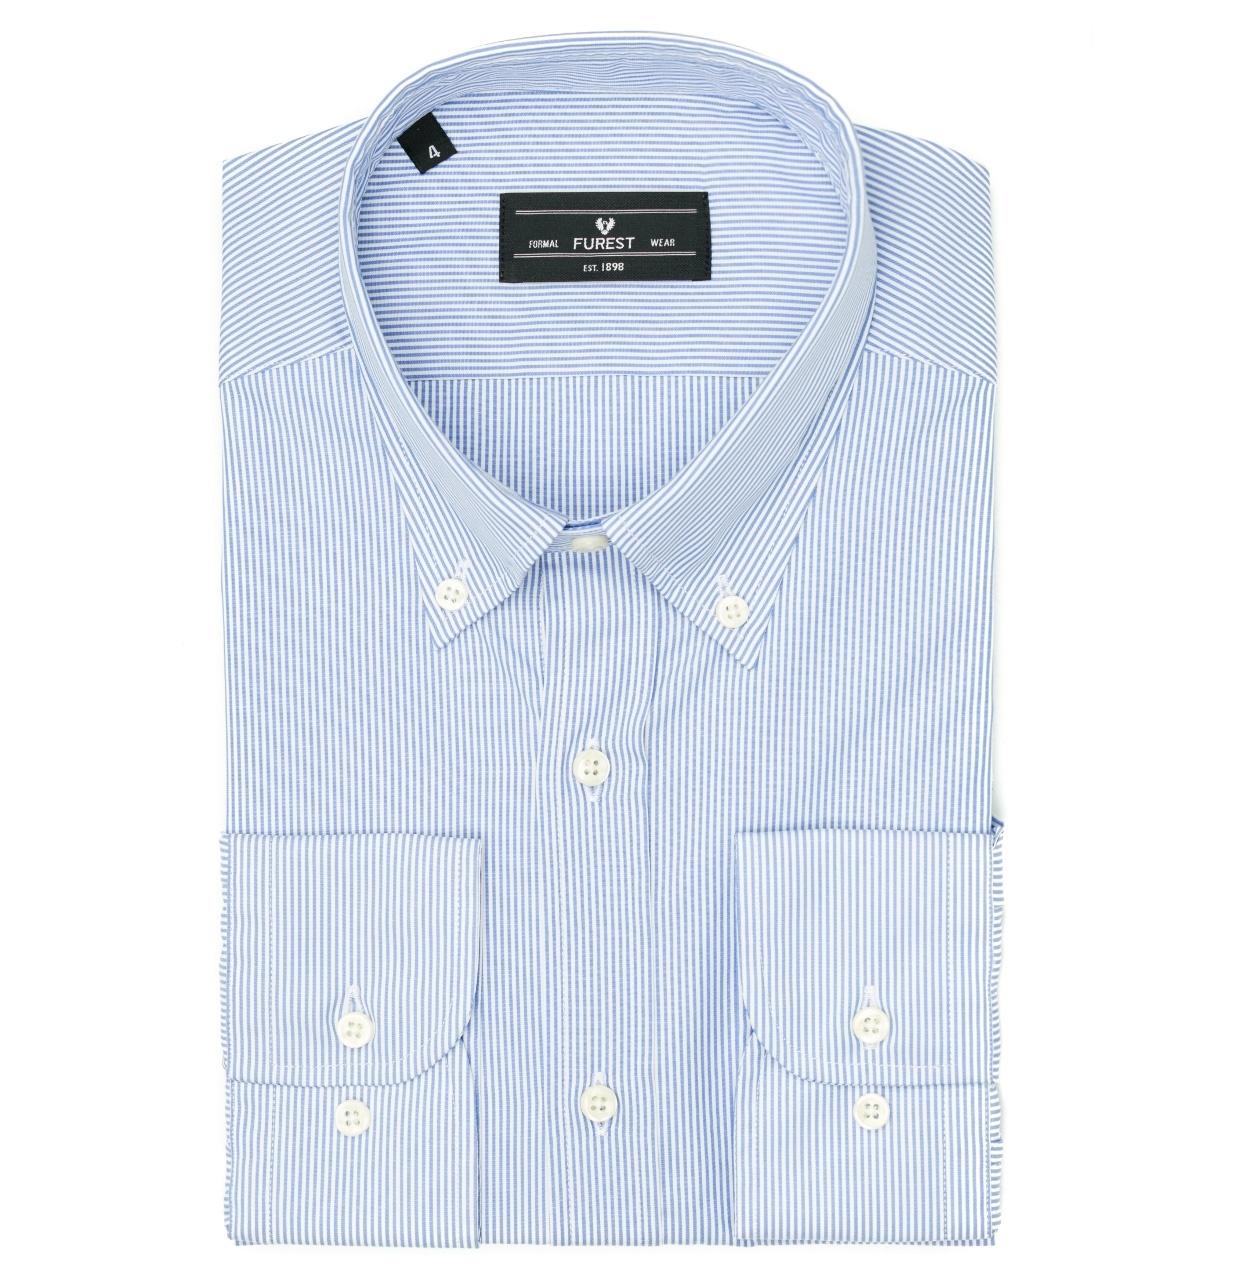 Camisa Formal Wear REGULAR FIT modelo BUTTON DOWN tejido rayas color azul,100% Algodón.